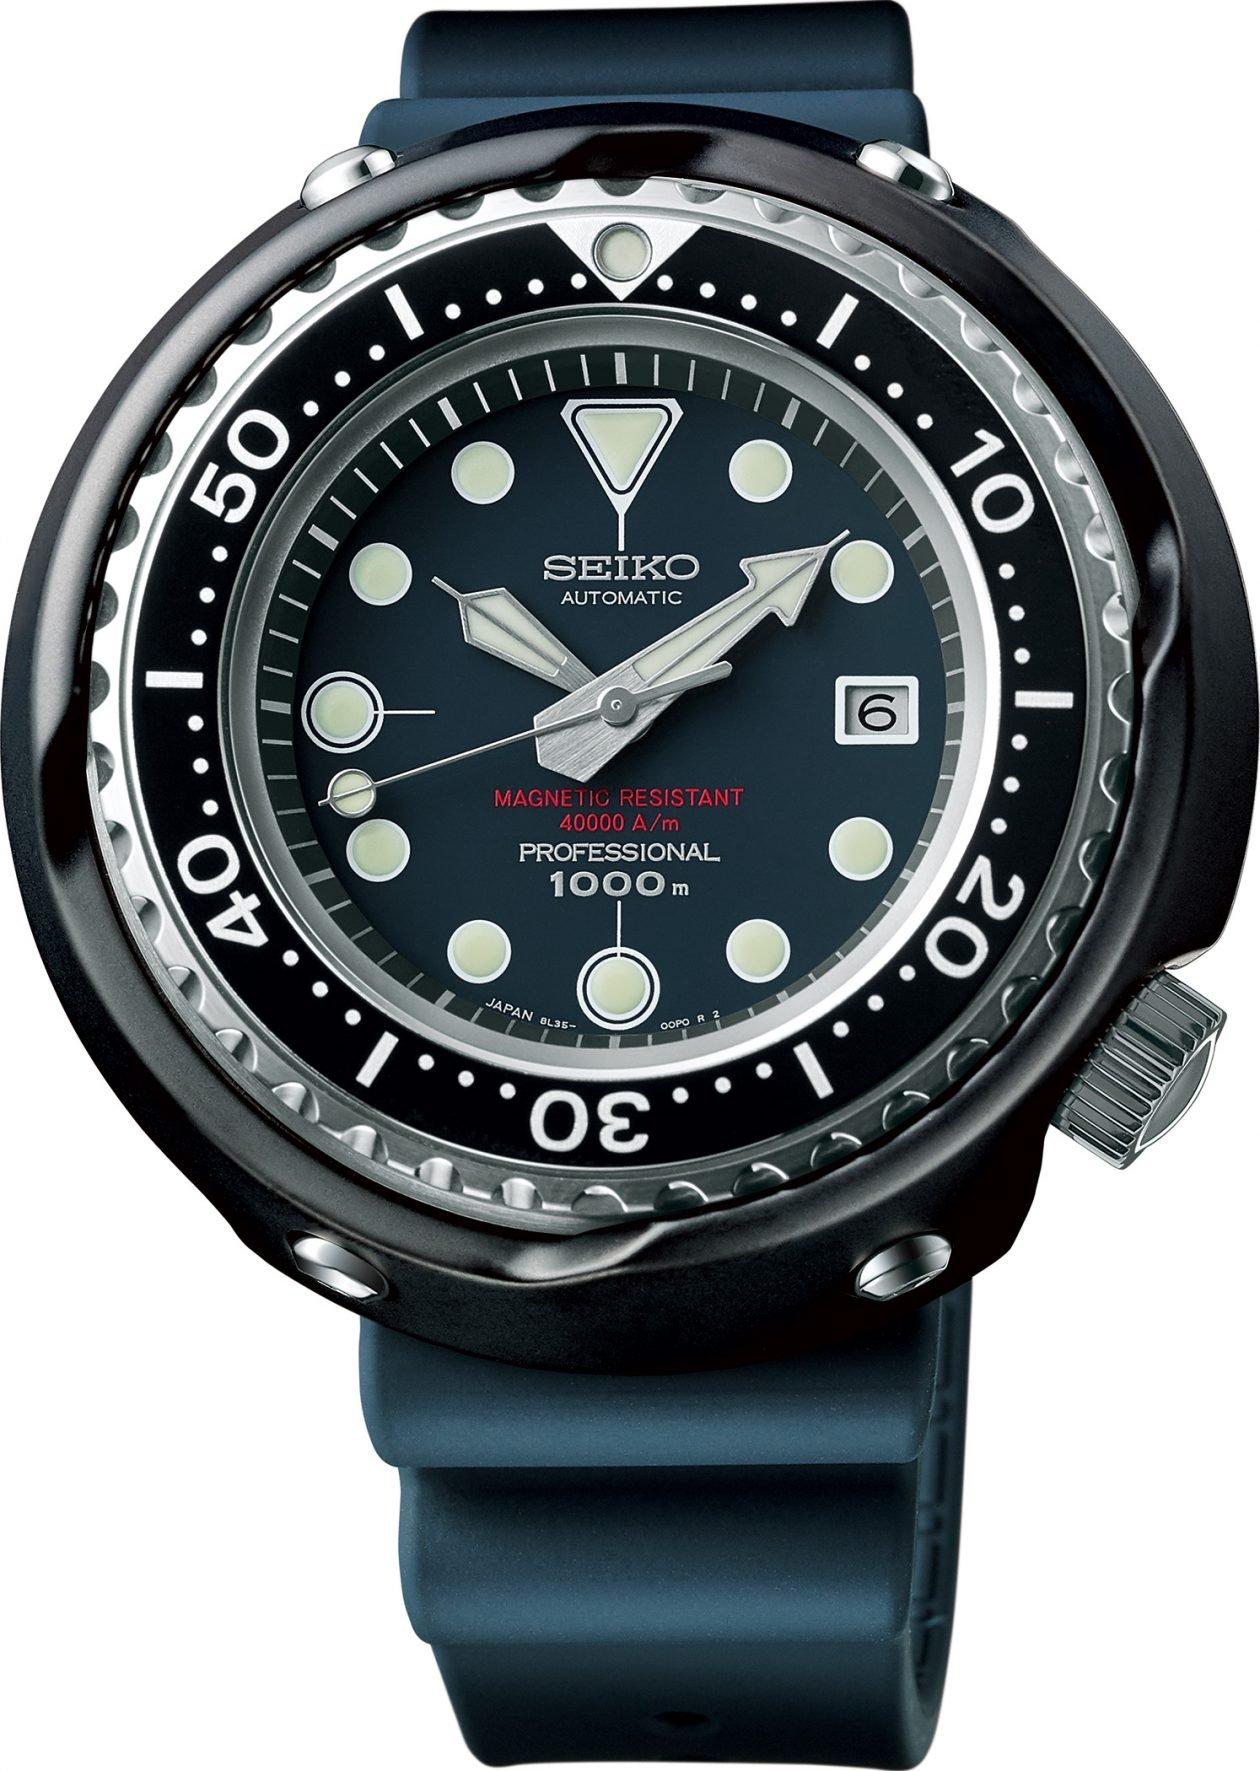 Seiko 1975 Professional Diver's 600m Re-creation (SLA041)